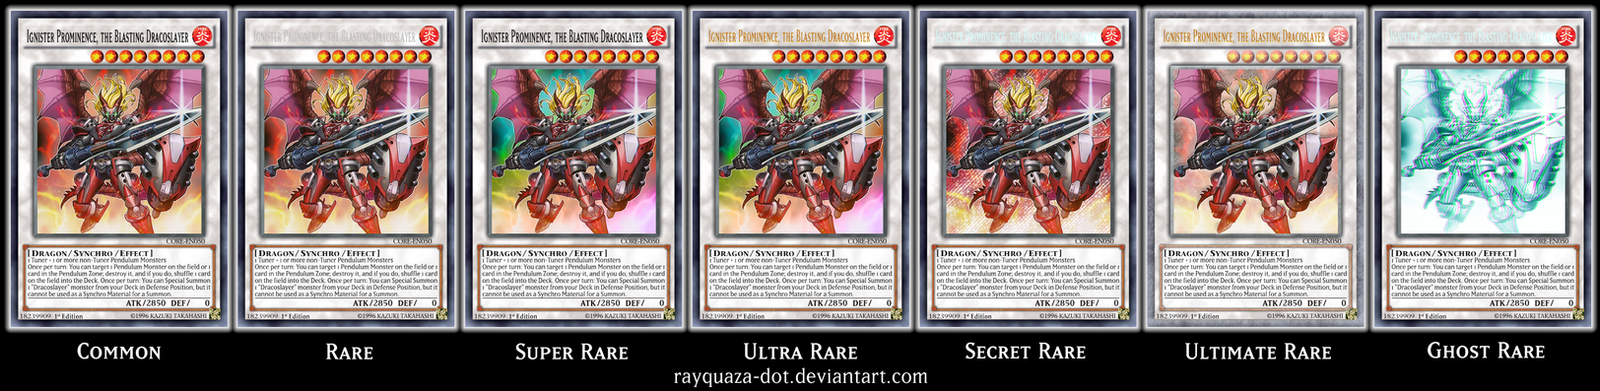 Rarity Presentation #3 by Rayquaza-dot